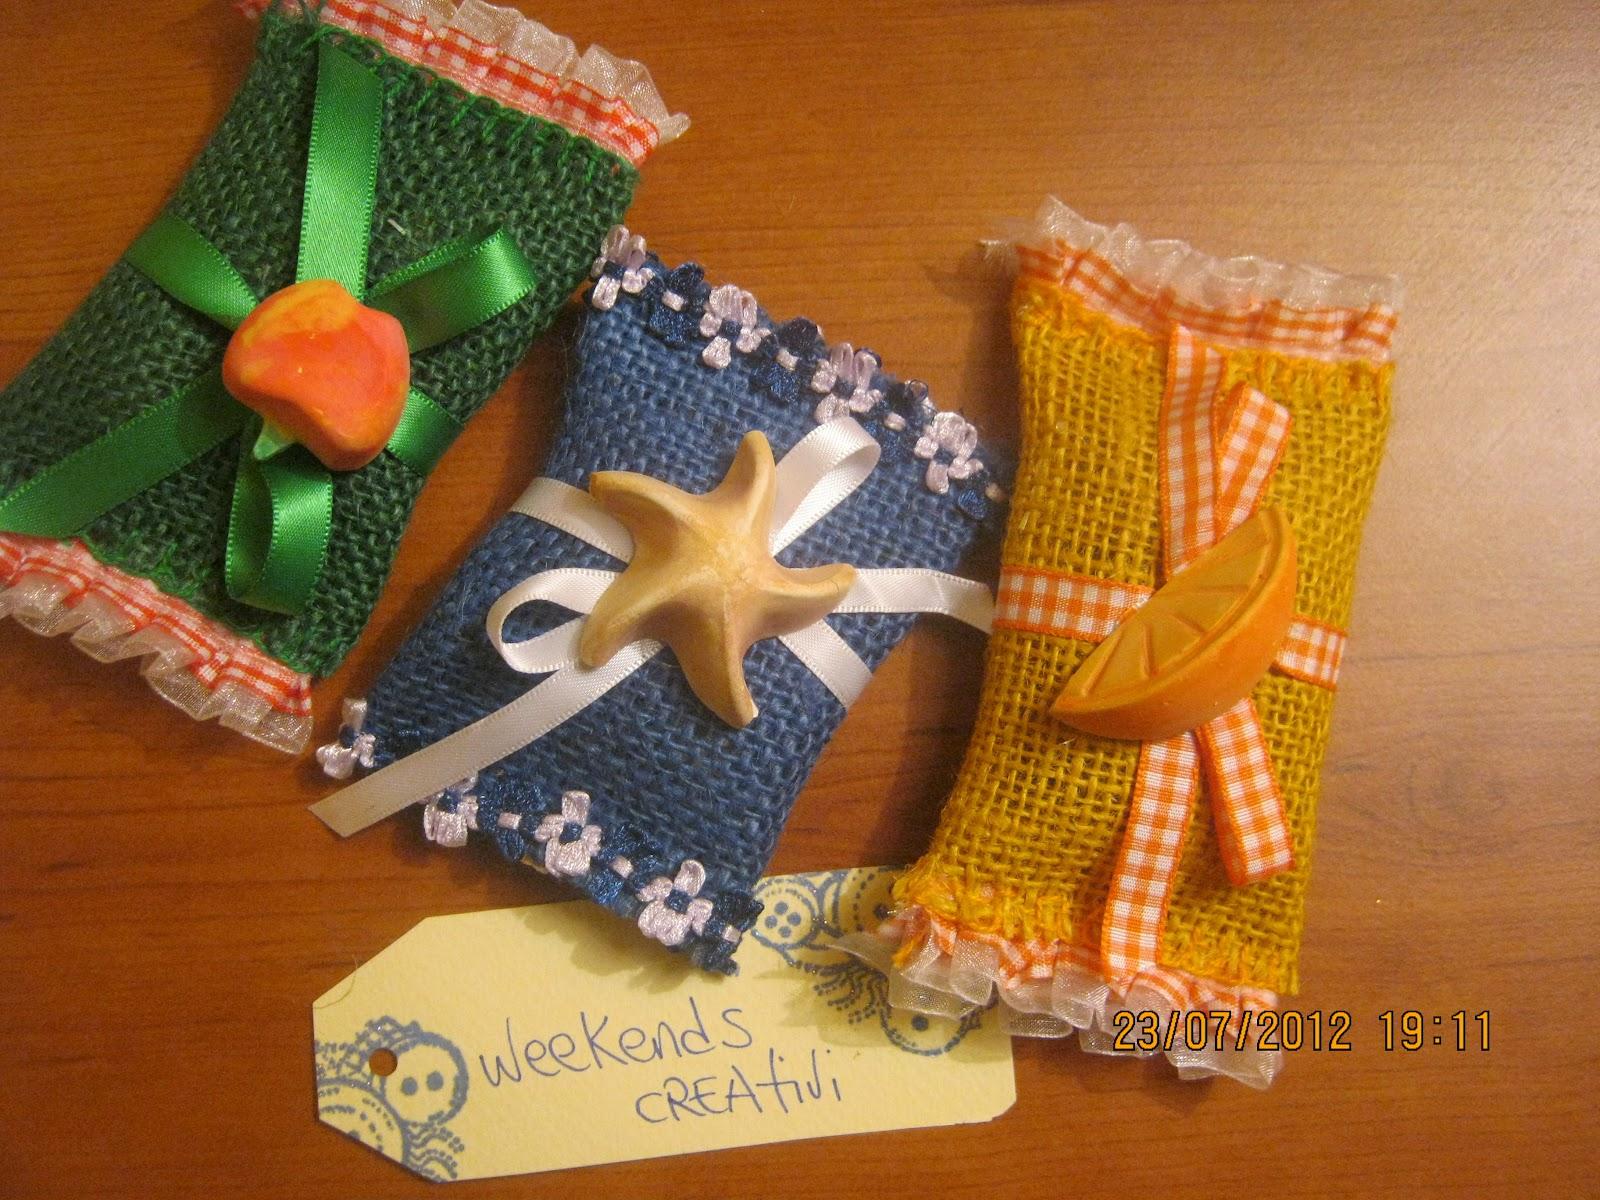 Week ends creativi sacchetti di juta porta confetti o - Porta pout pourri ...